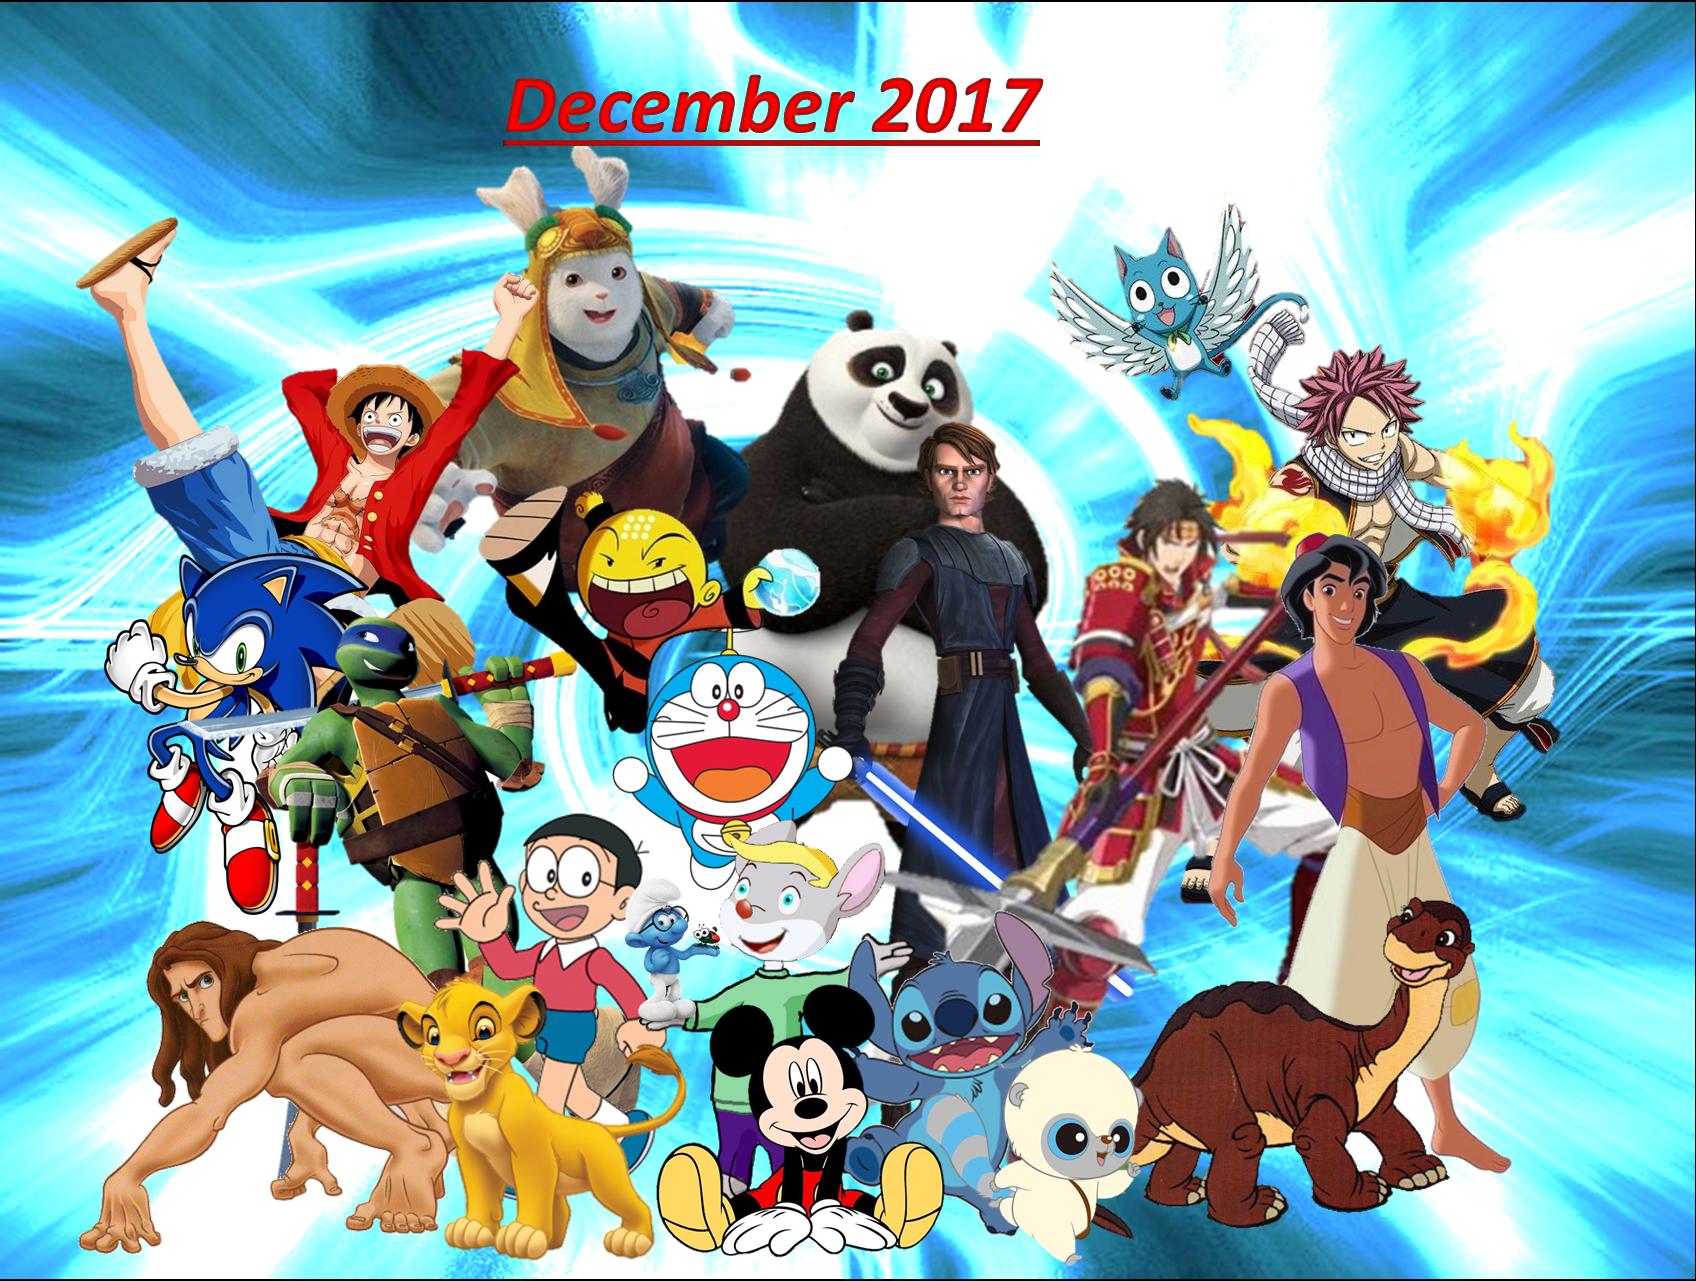 December 2017 by vasilia95